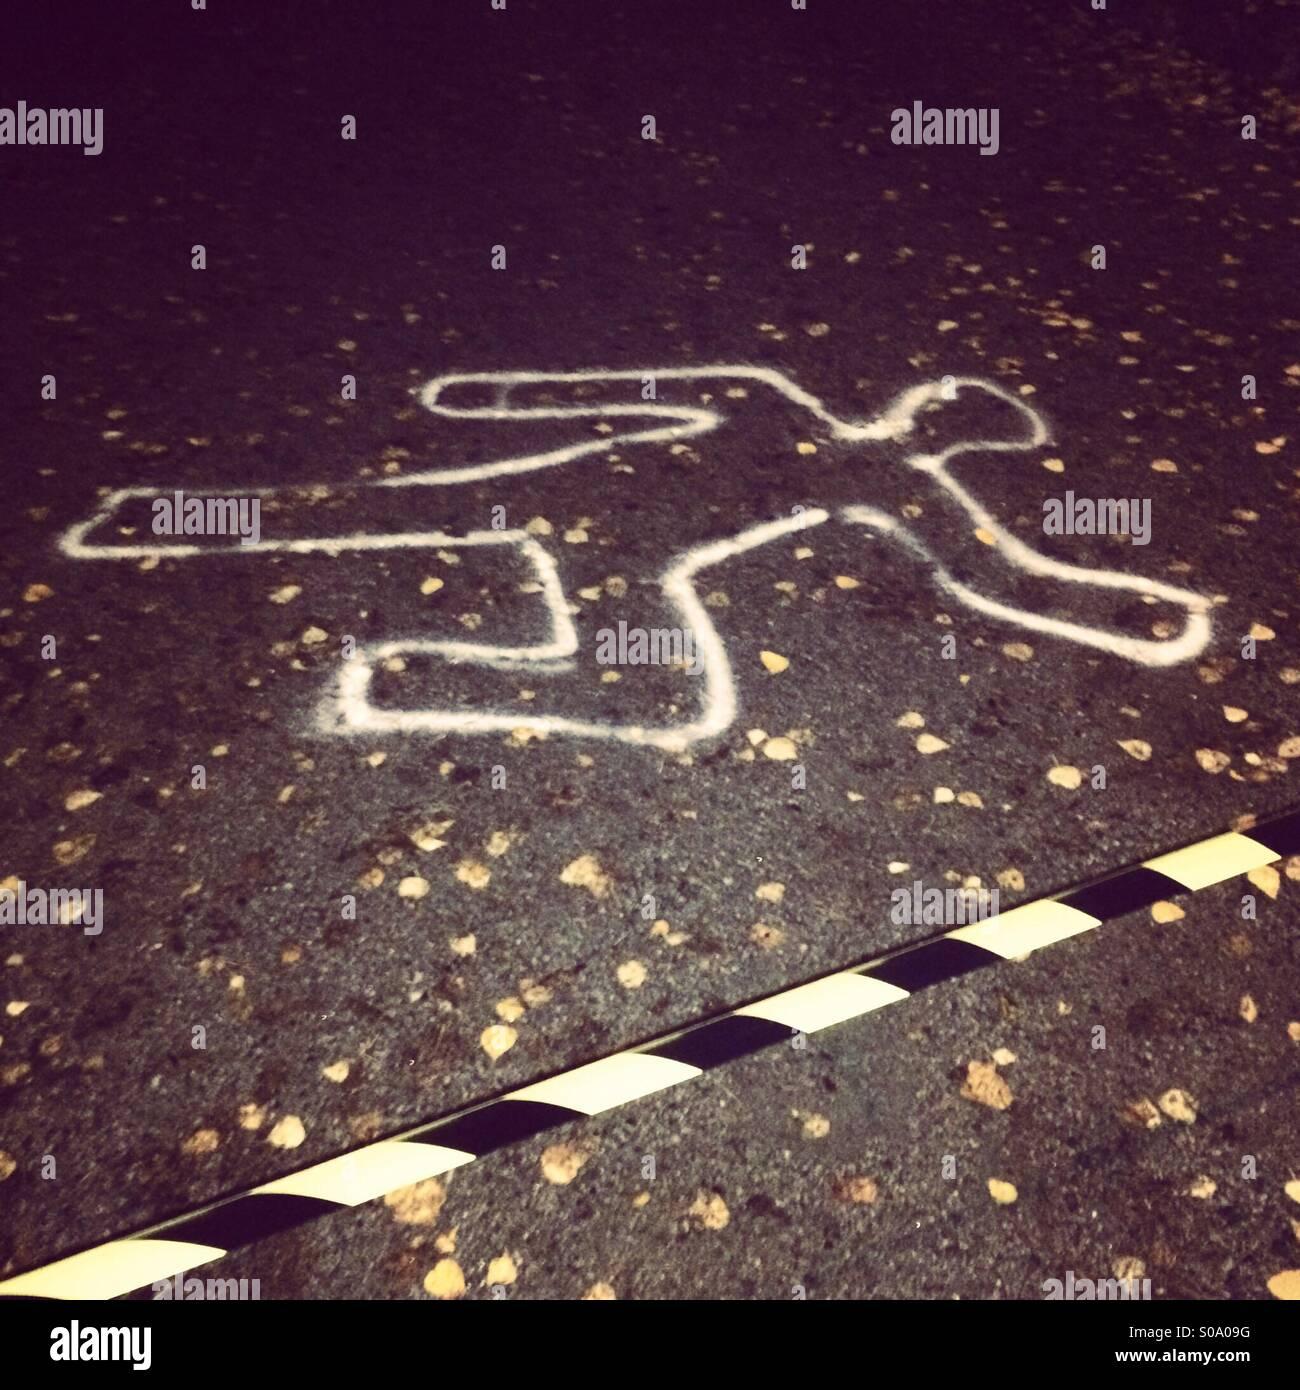 Crime scene draw around the body halloween Stock Photo: 310006412